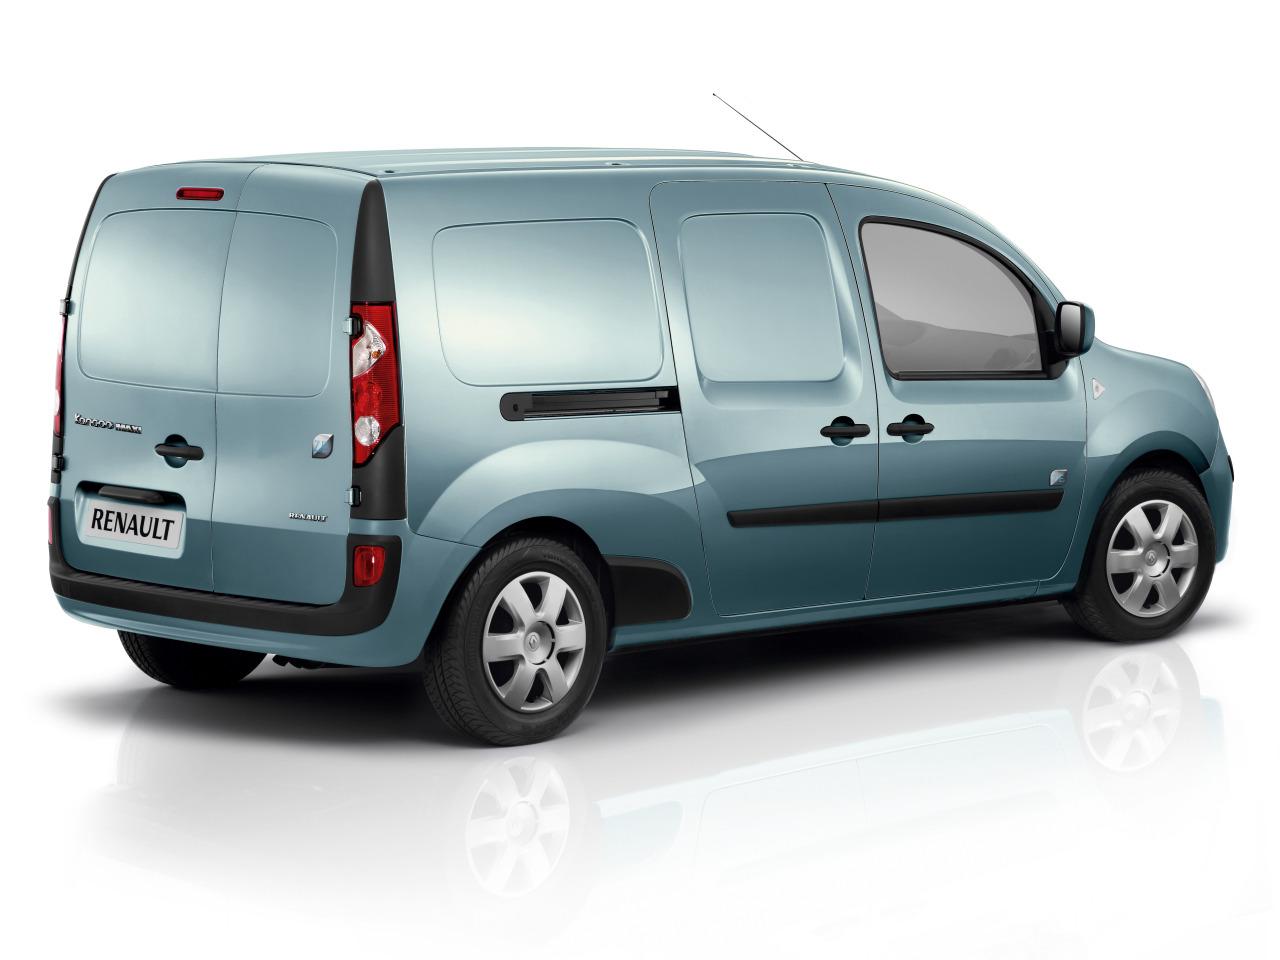 autos eco friendly nuevo renault kangoo maxi ze. Black Bedroom Furniture Sets. Home Design Ideas